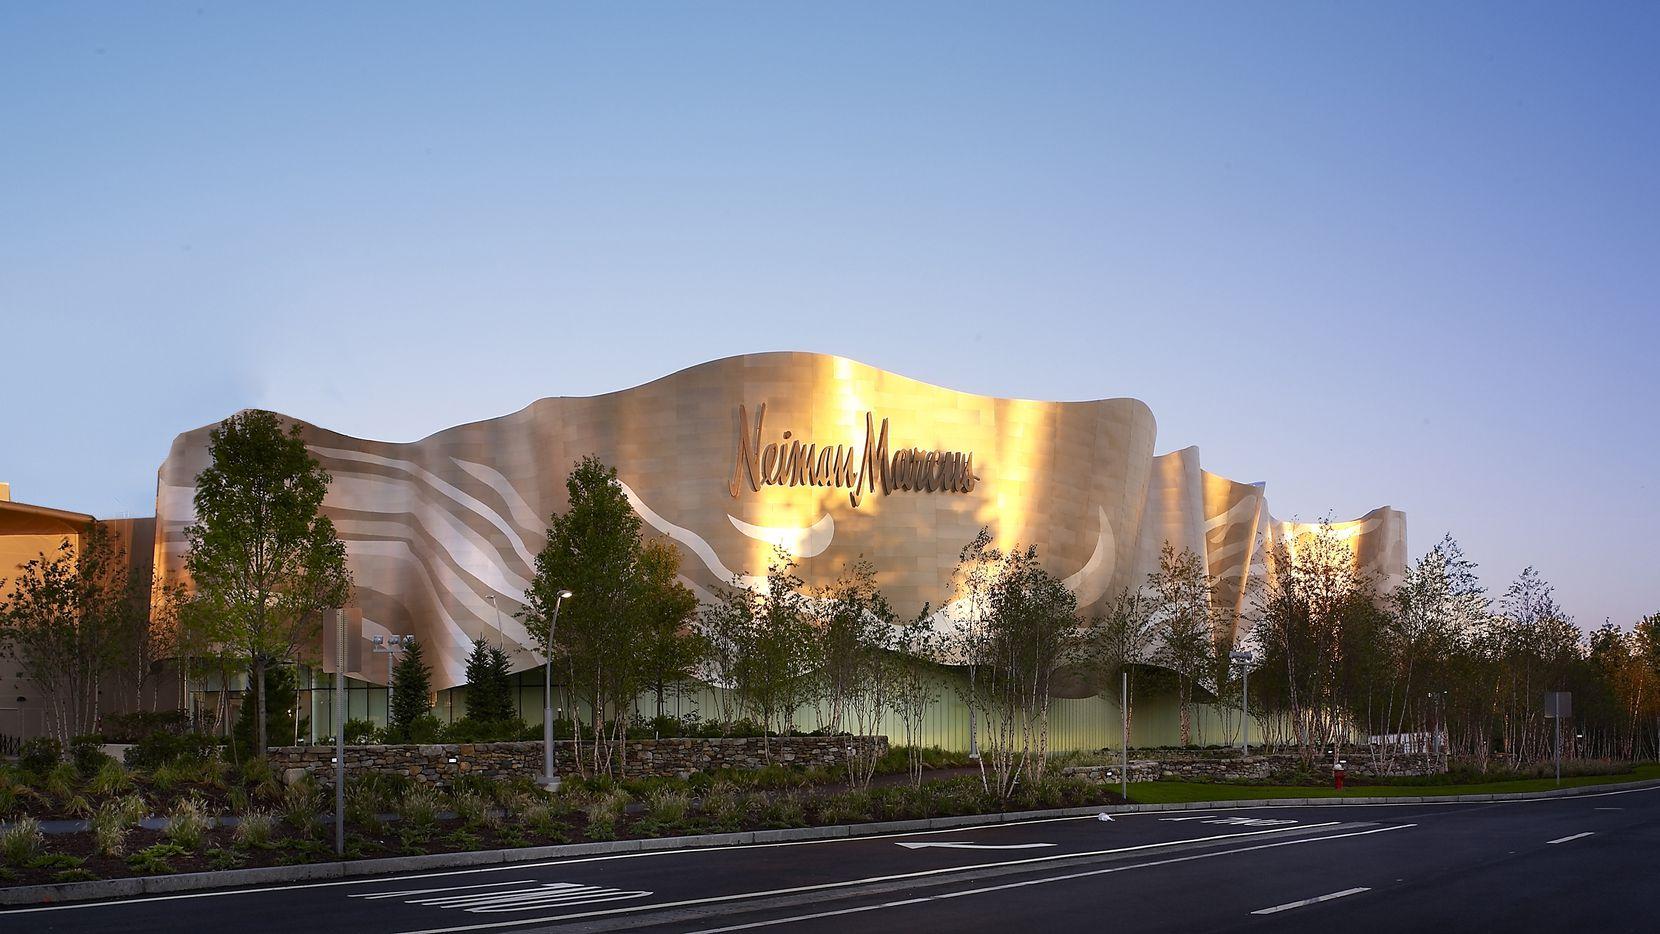 Neiman Marcus store in Natick, Mass., opened in 2007.